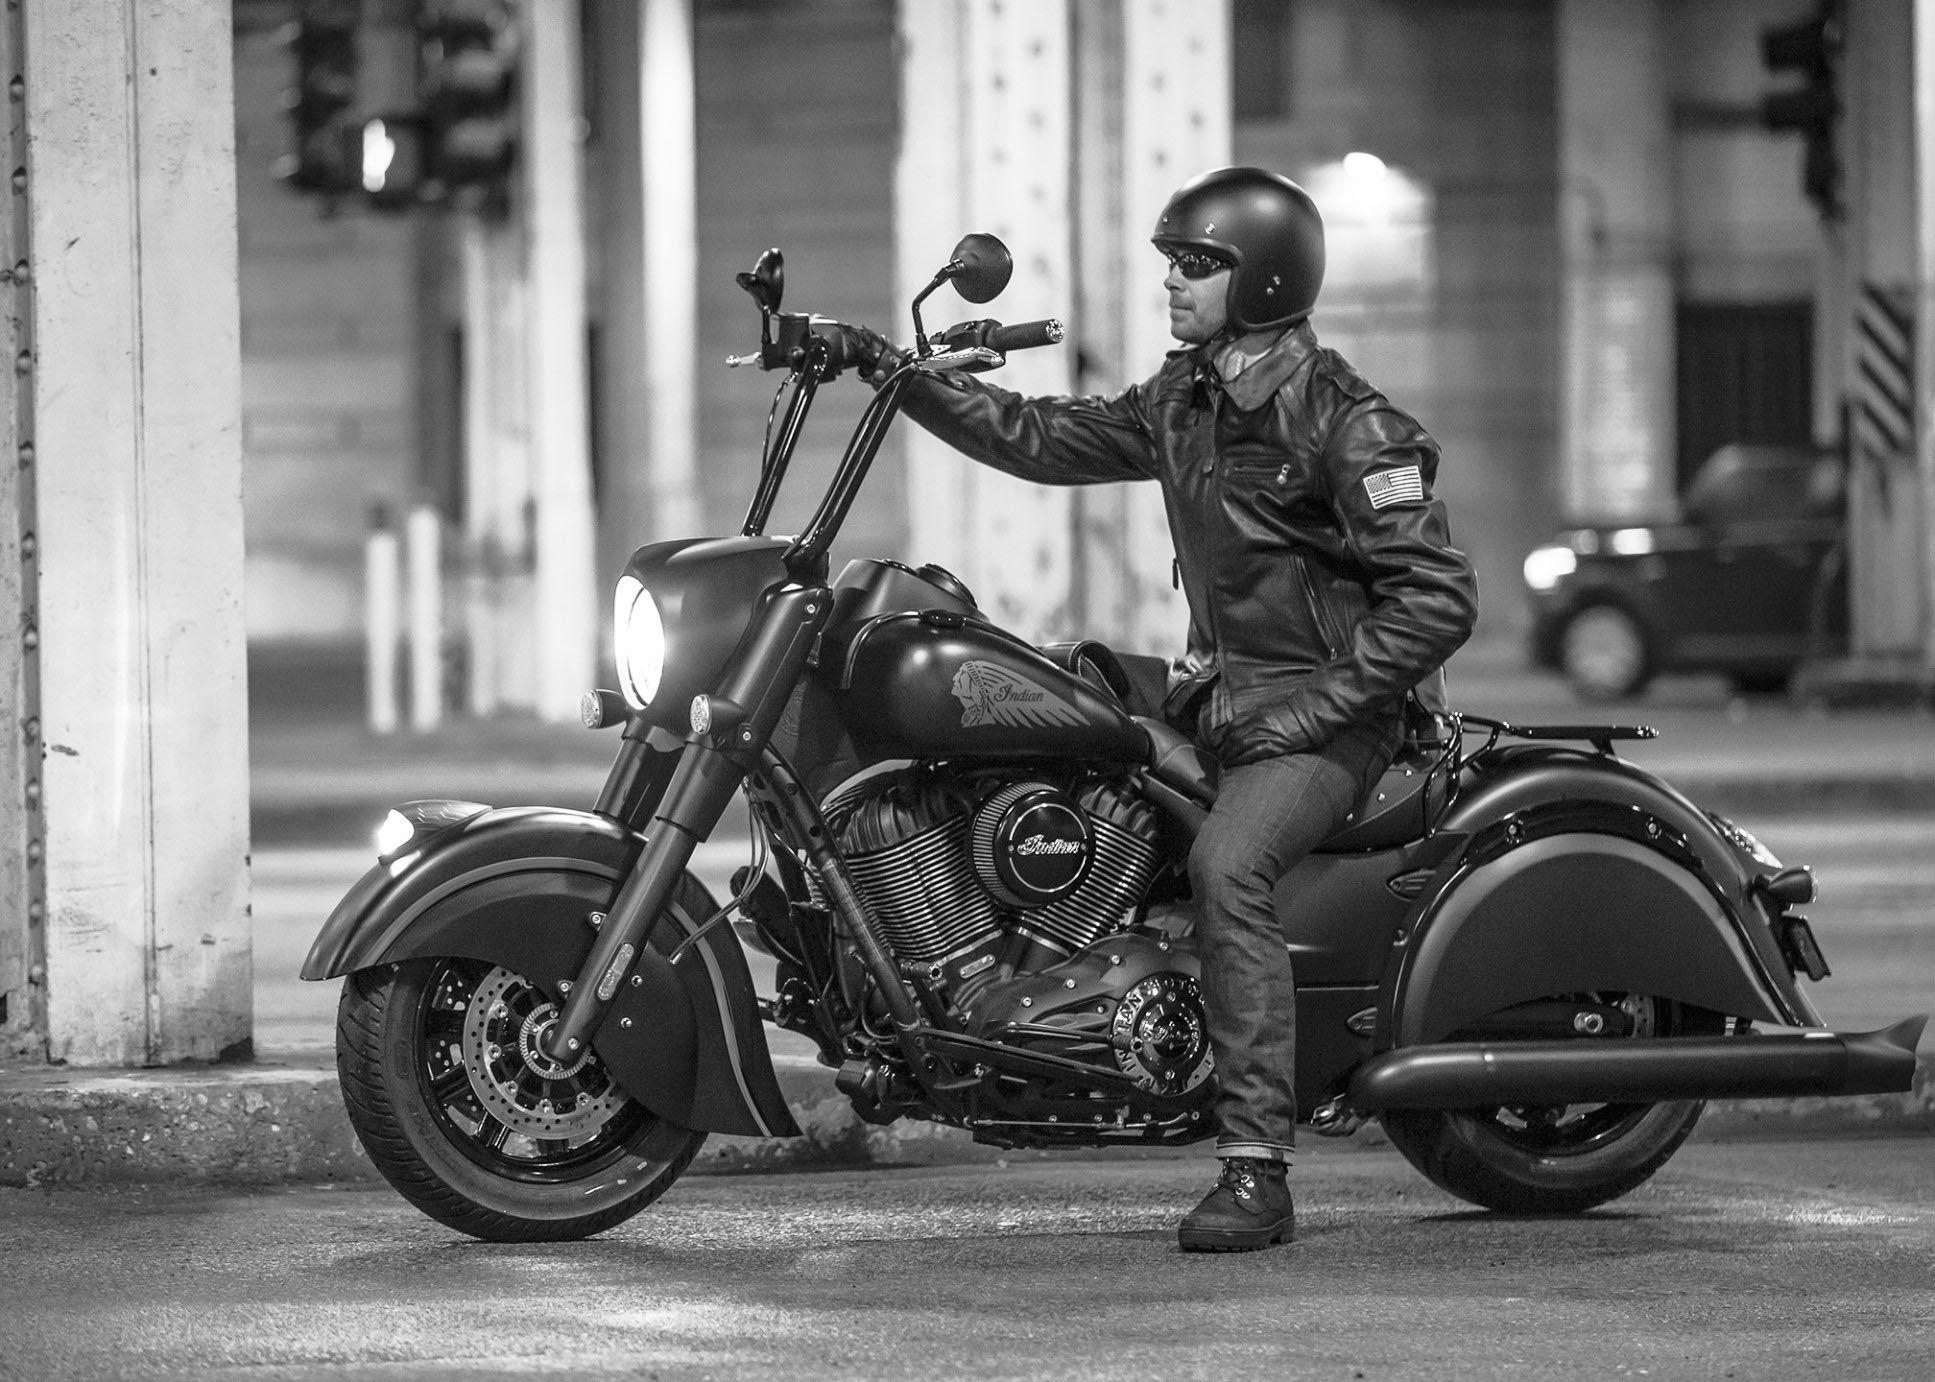 Rick Roush Honda Motorcycles >> 2016 Indian Chief Dark Horse HD Wallpaper | Motorcycles HD Wallpaper | Pinterest